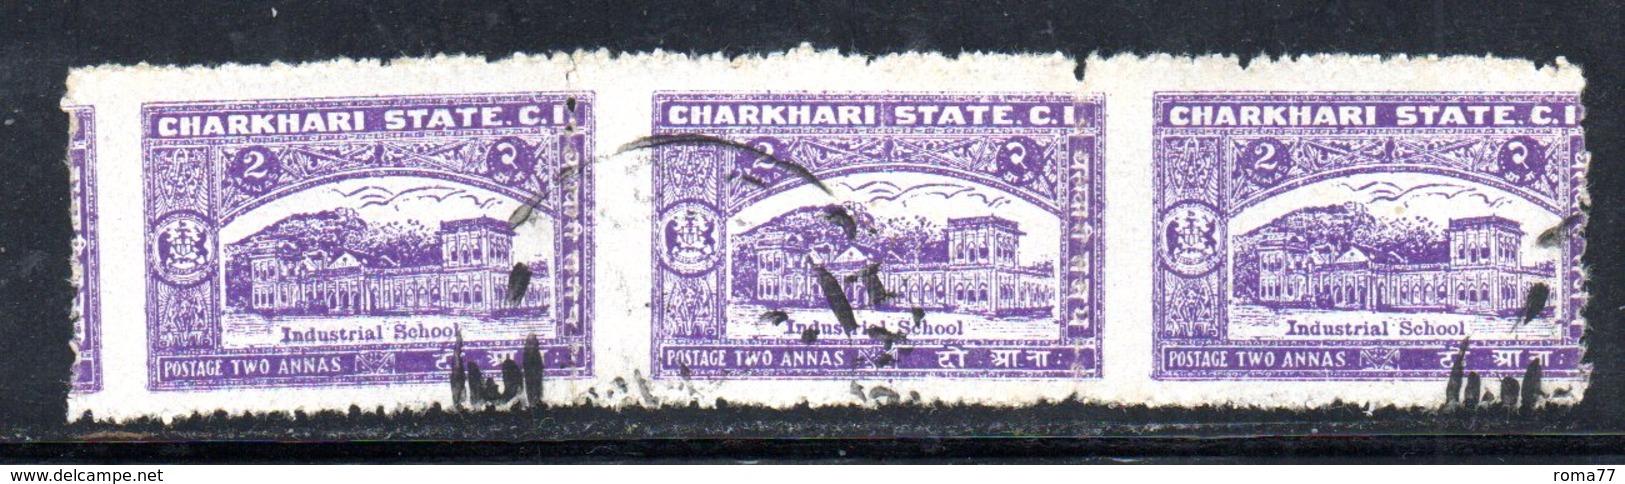 W1709 - CHARKHARI INDIA ,  2 Anna : Striscia Ripiegata Di Tre Usata - Charkhari